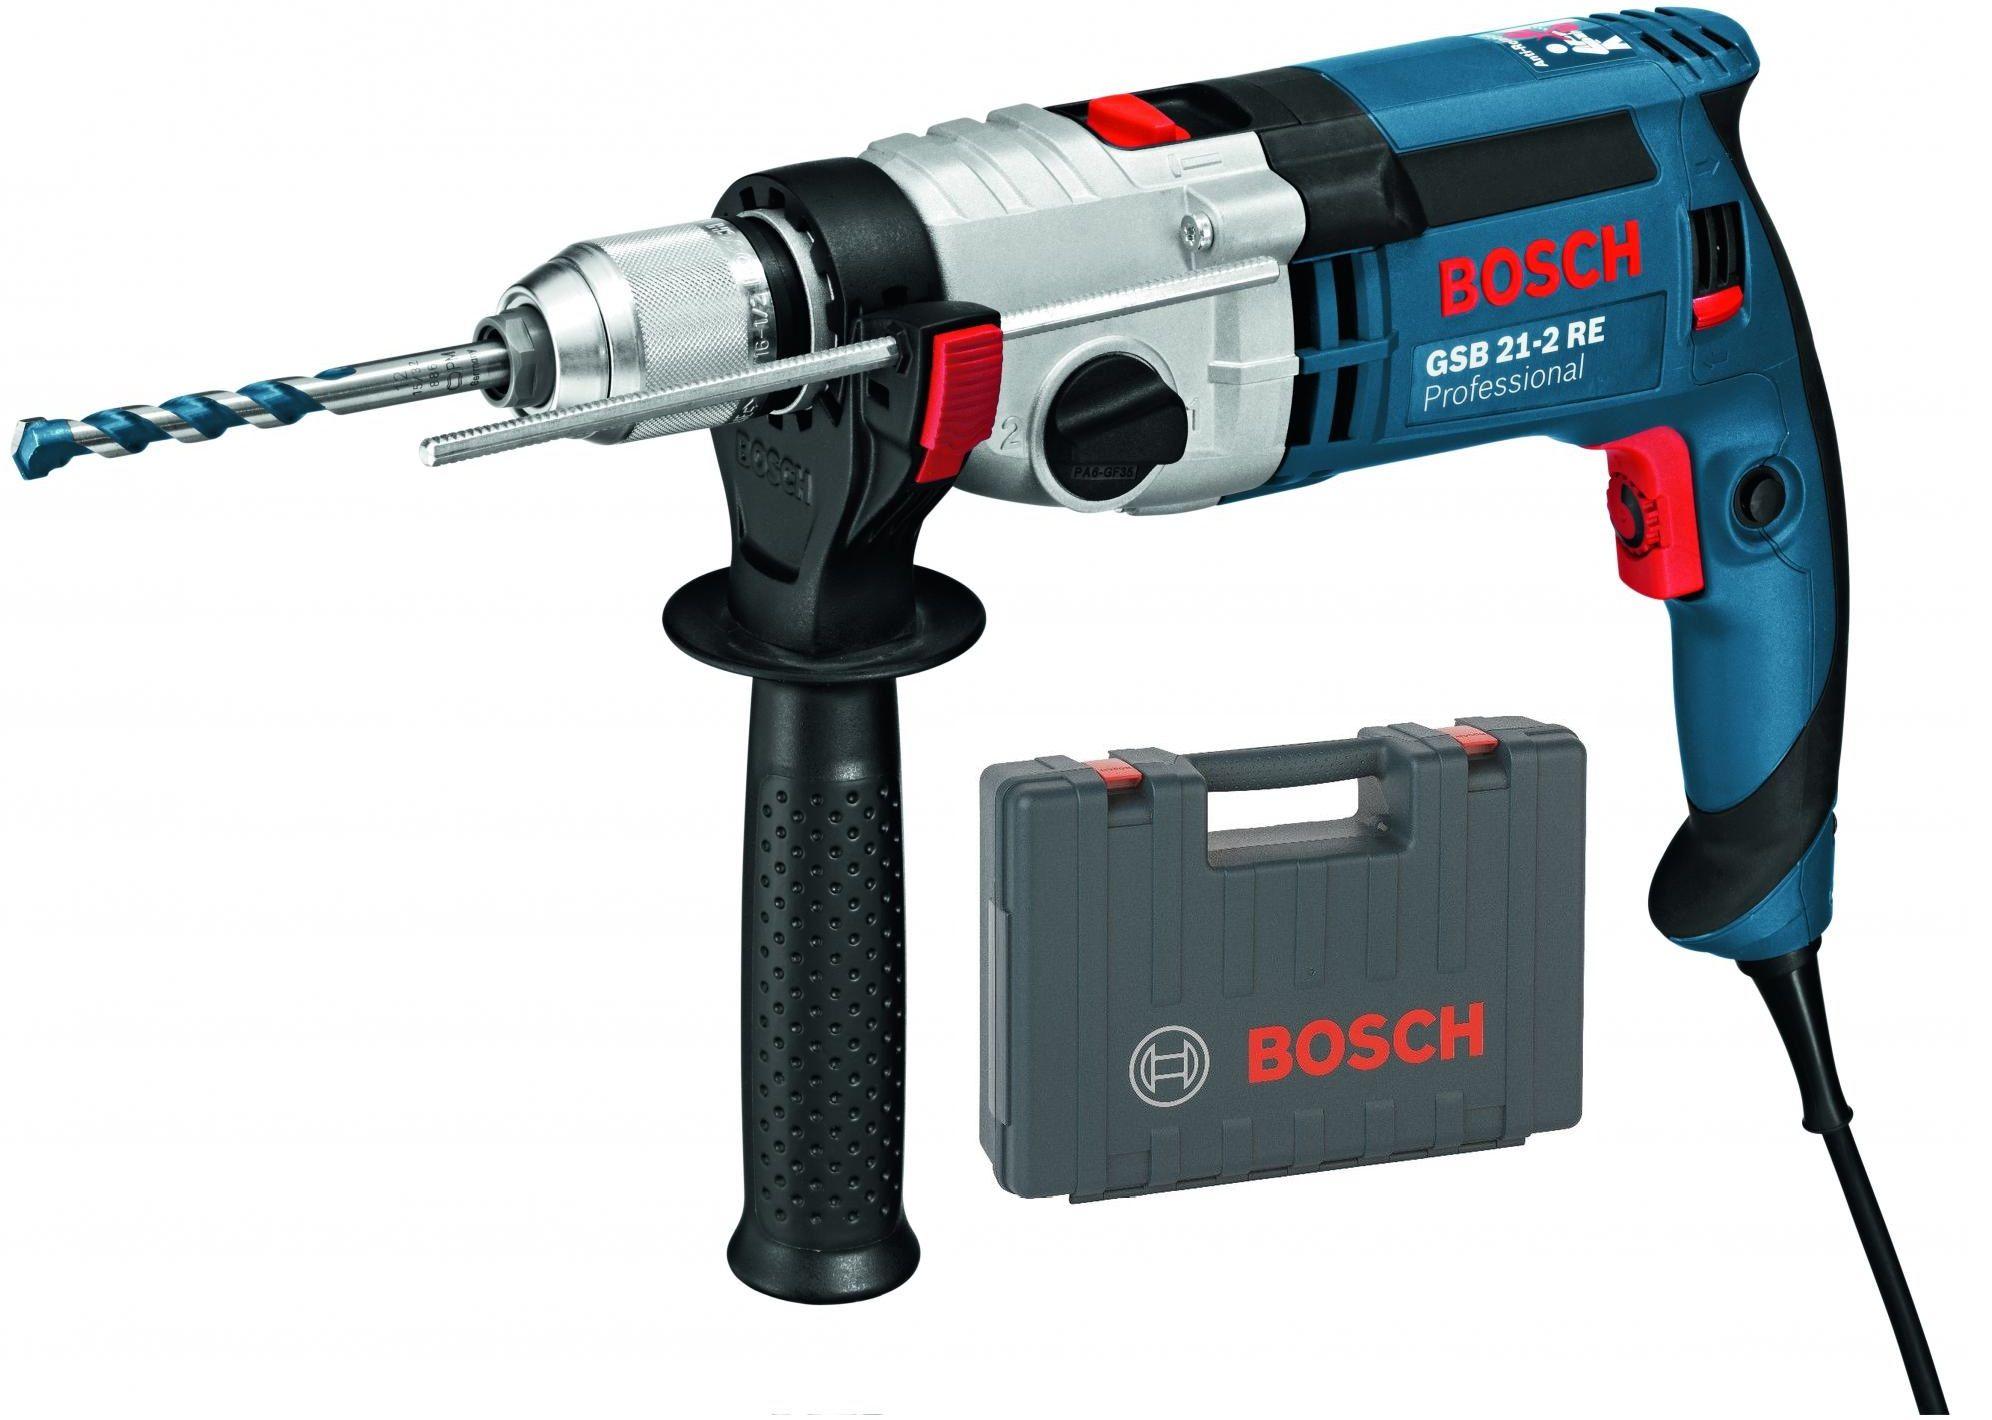 Bosch GSB 21-2 RE kopen?   Snelle levering - Gereedschapcentrum.nl